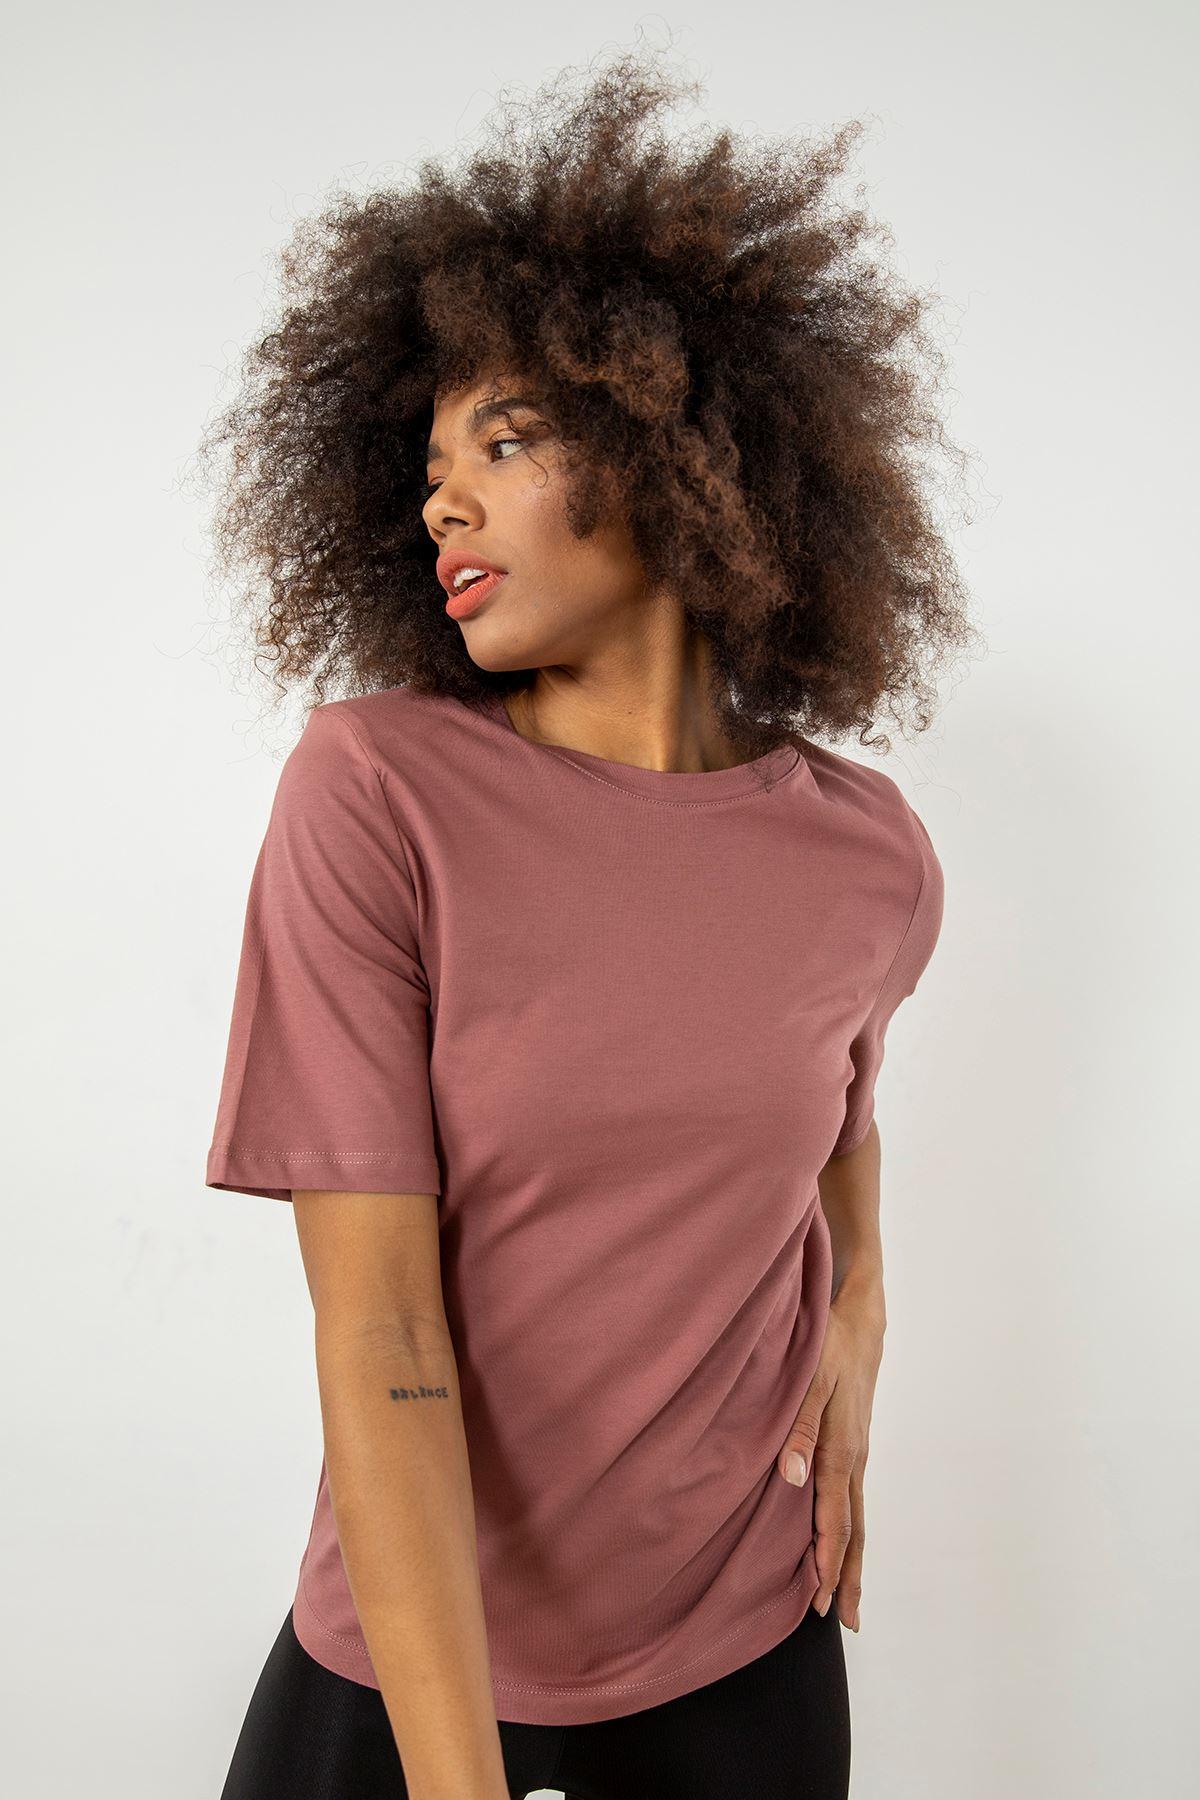 Vatkalı T-shirt-Gül Kurusu